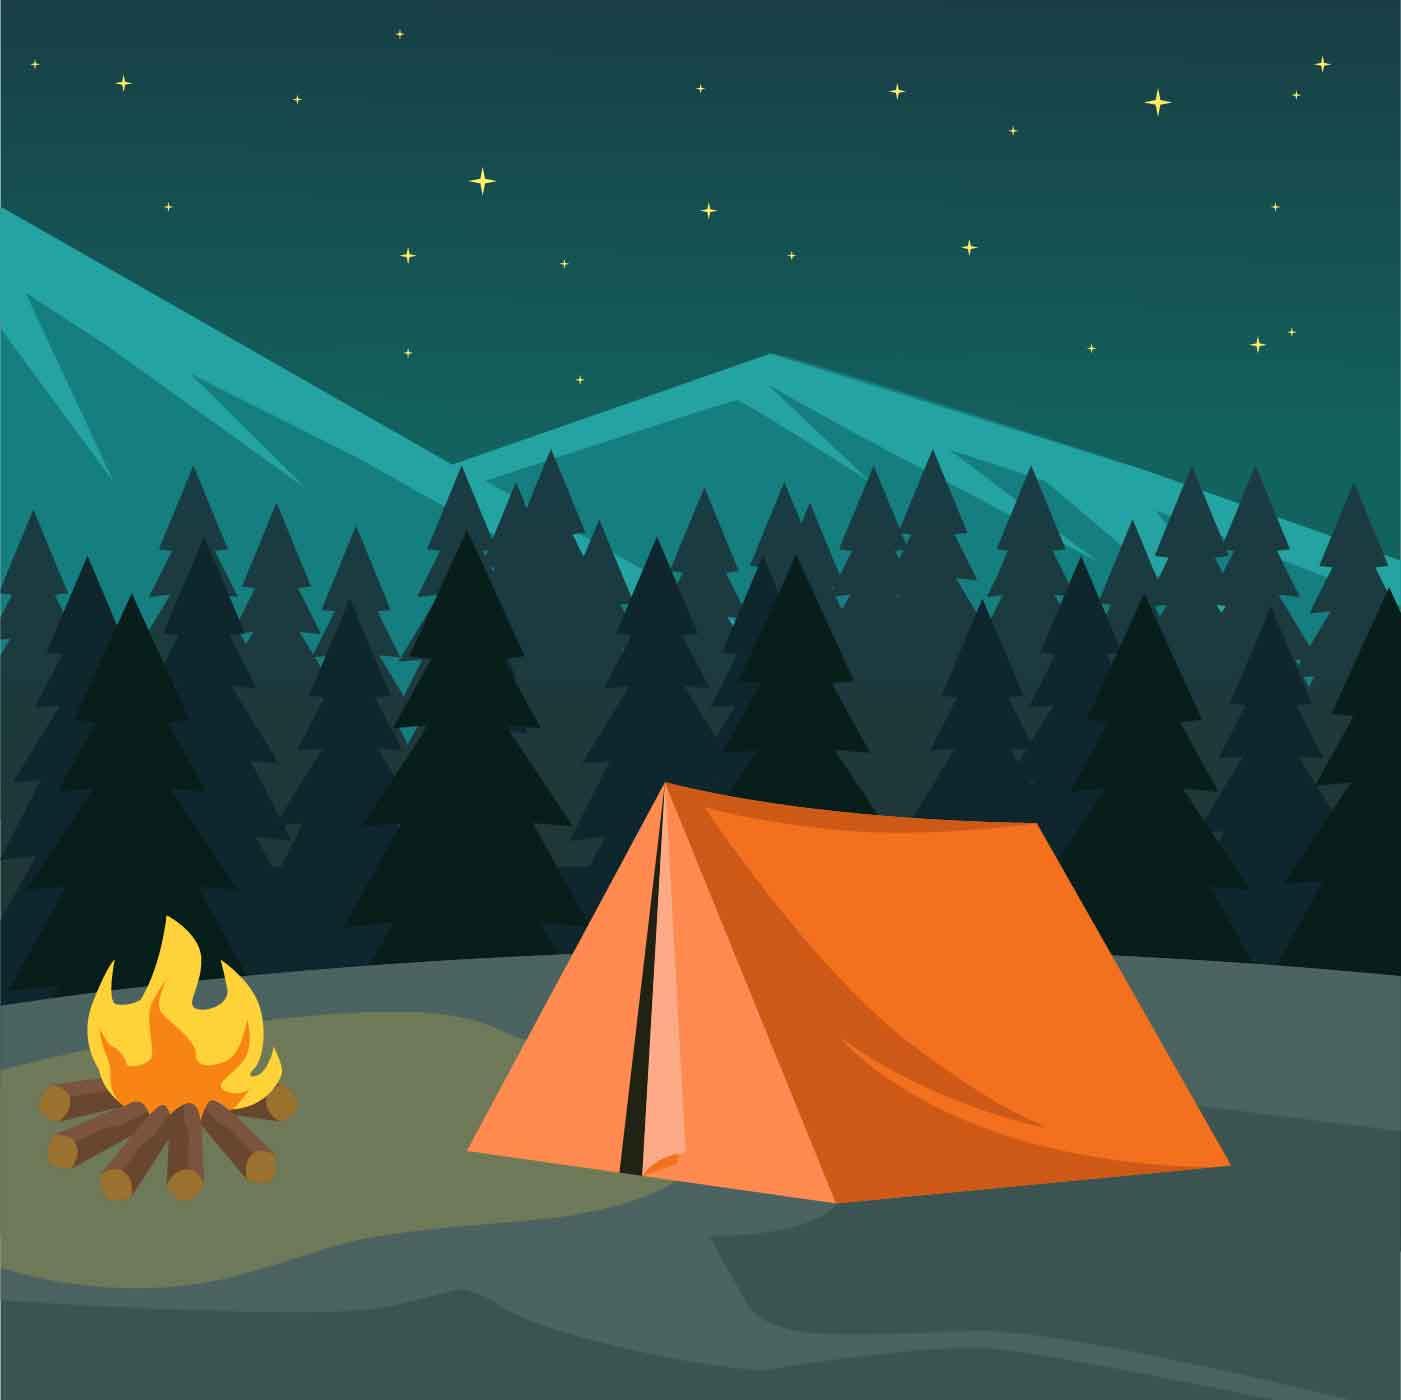 Night Camping Illustration Vector Download Free Vector